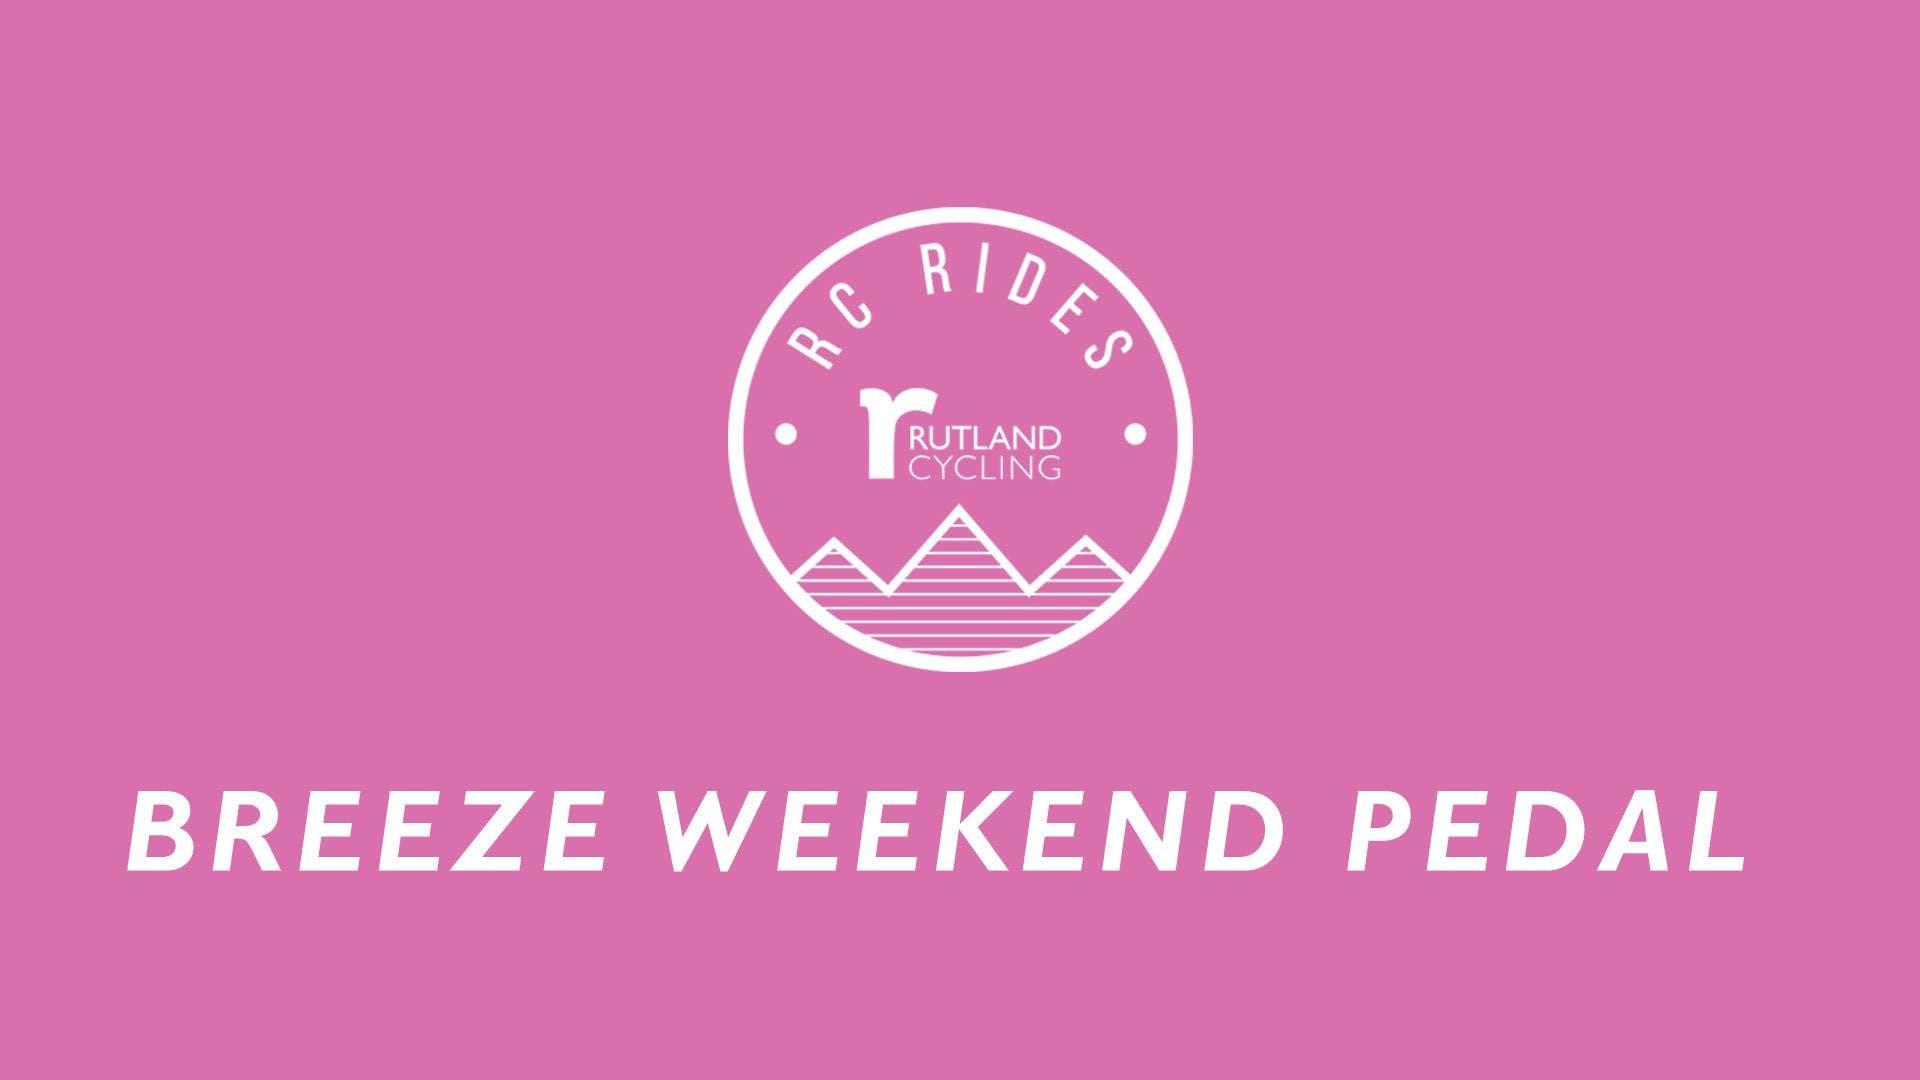 Breeze Weekend Pedal Ride - Ferry Meadows